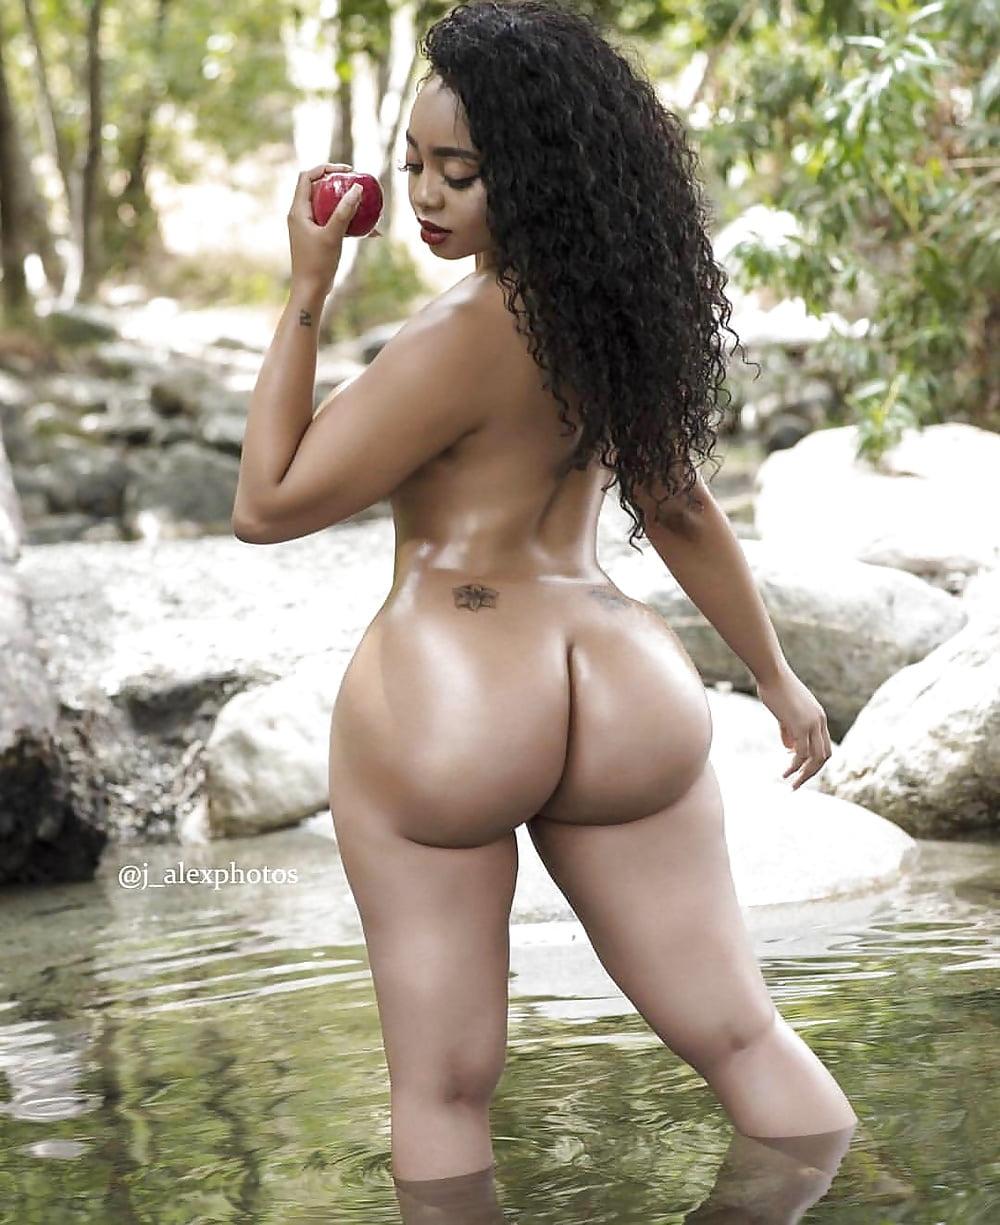 Photos Of Hot Latin Girls And Brazilian Girls In Bikini Hot Latina Girls Post